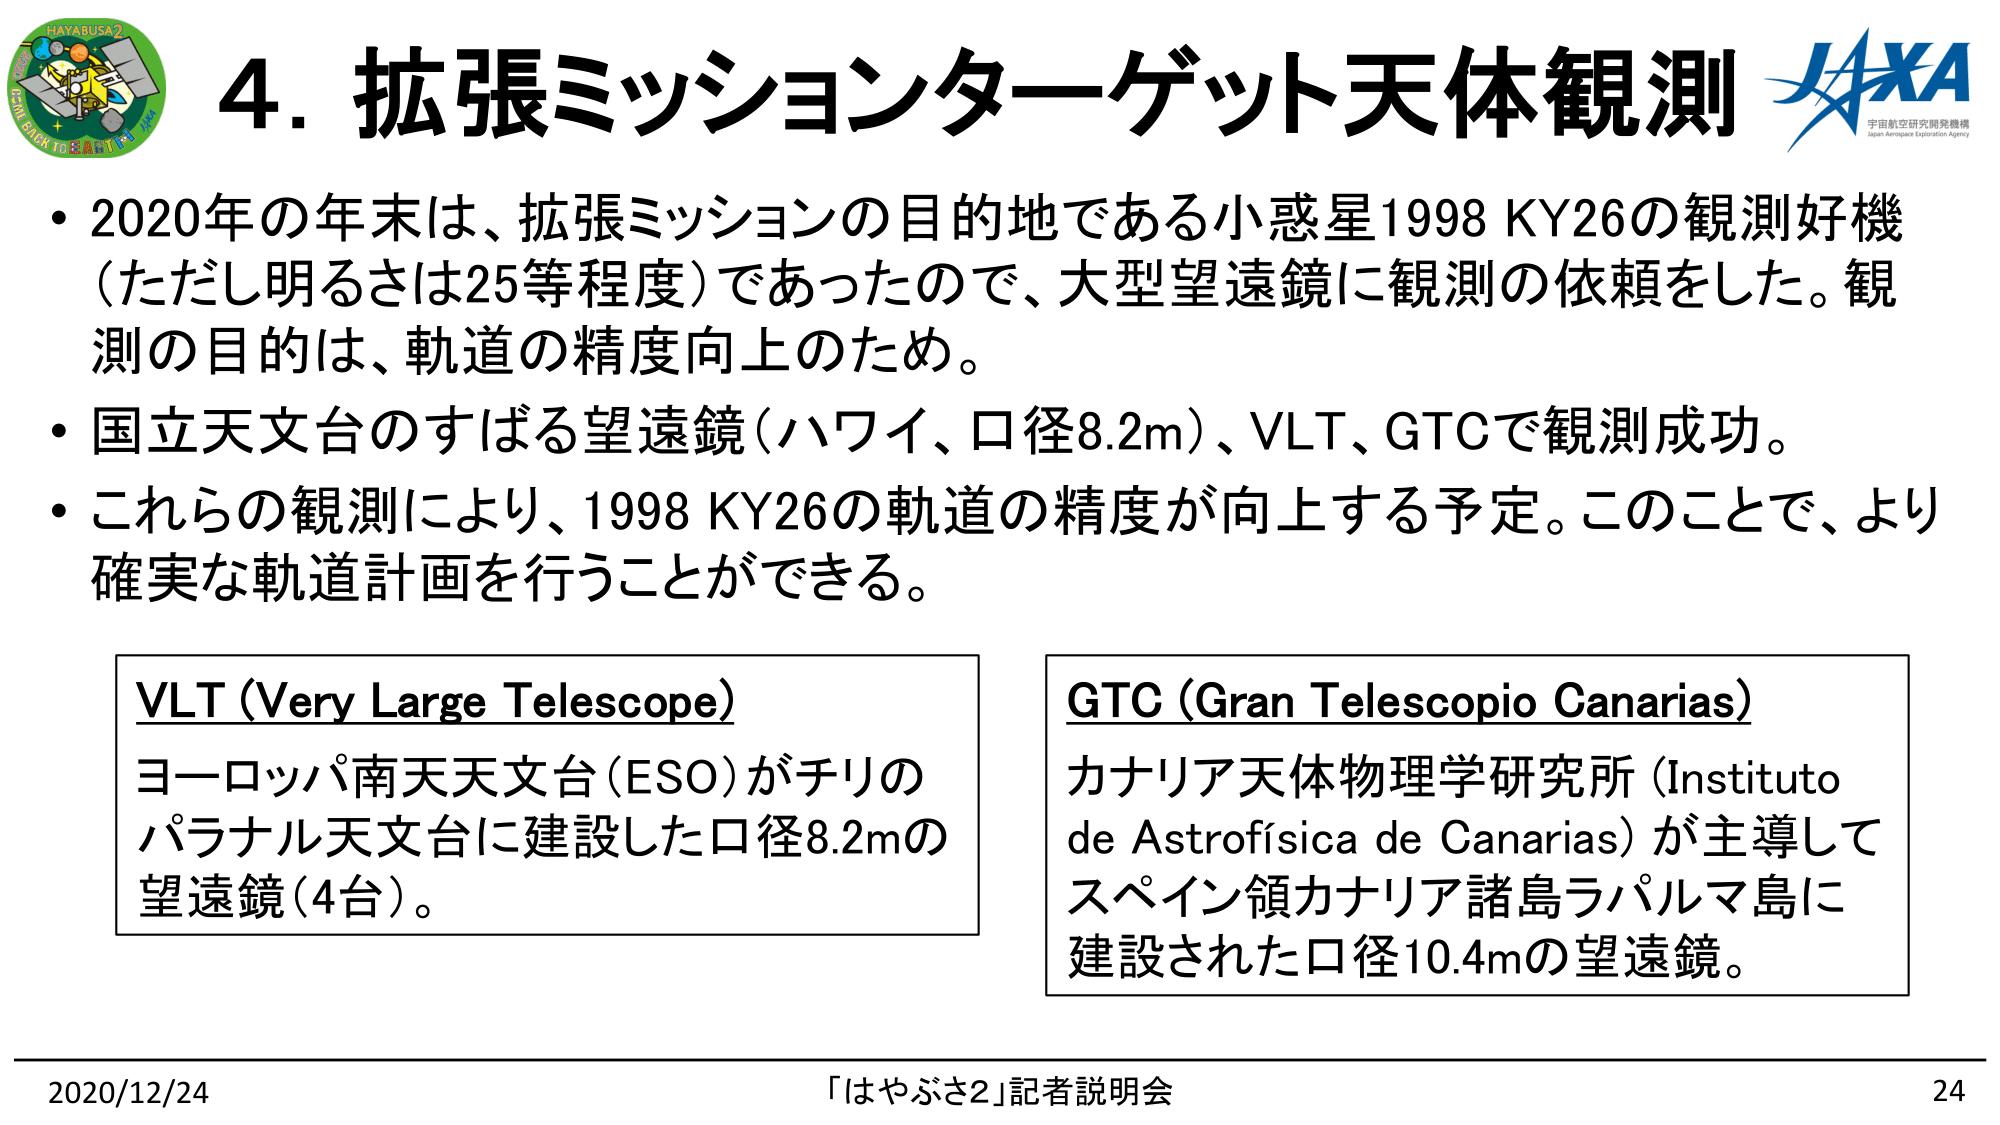 f:id:Imamura:20201224135236p:plain